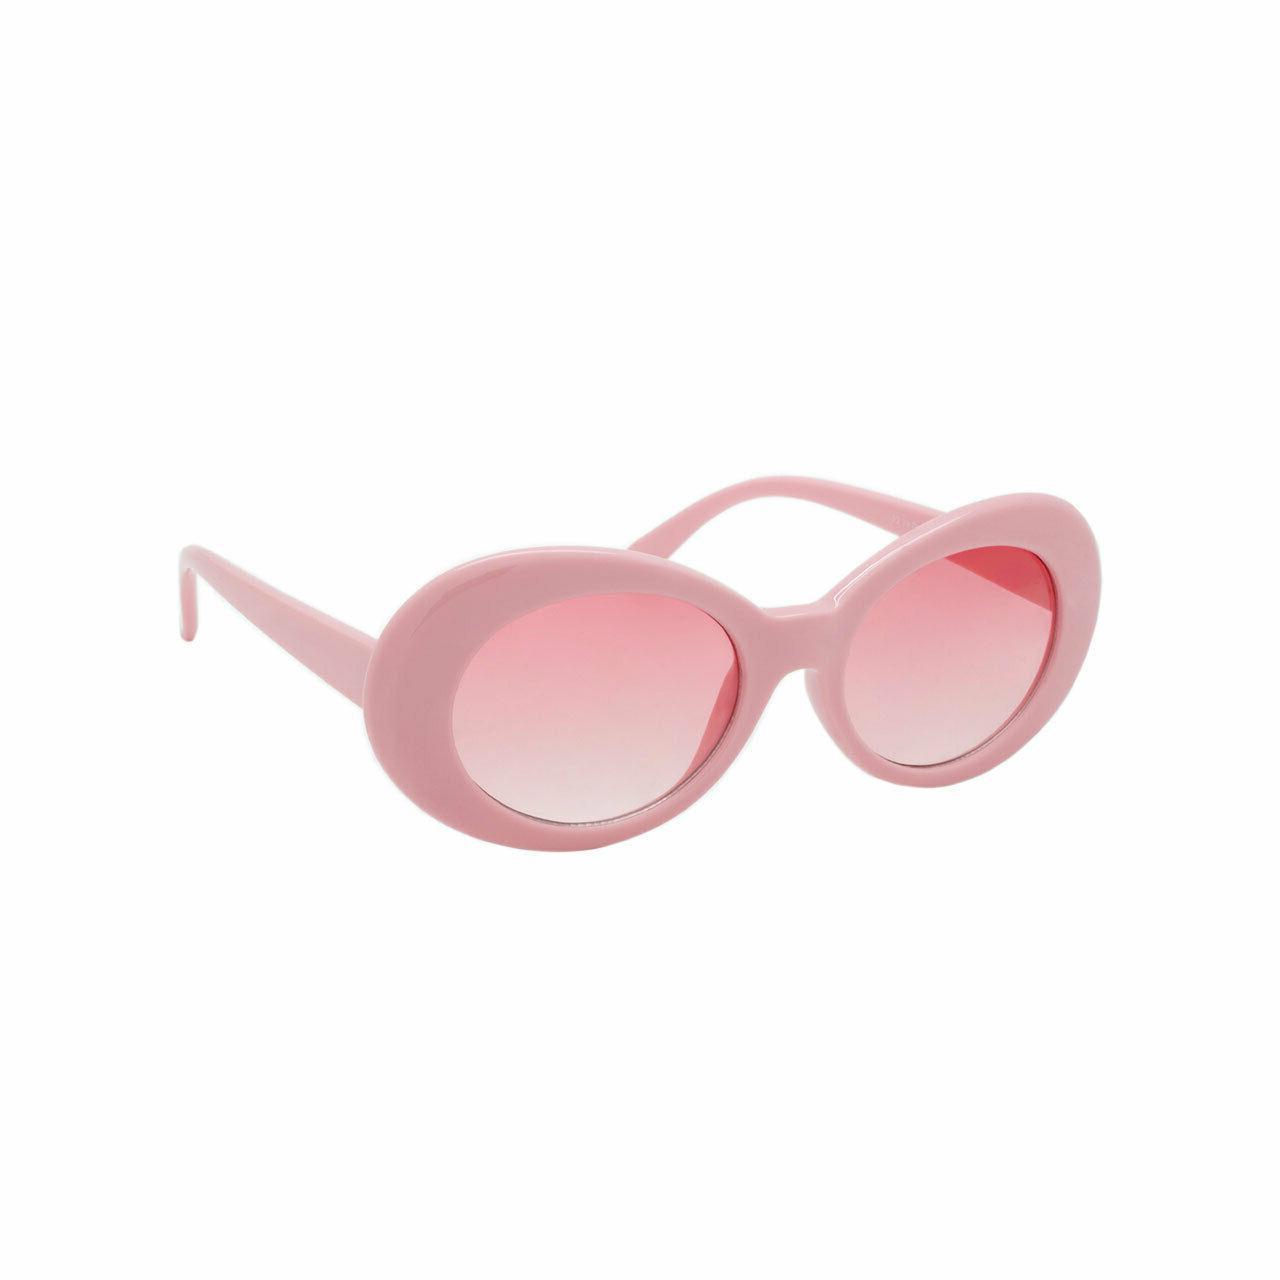 Bulk Lot Wholesale Fashion Sunglasses Assorted Men